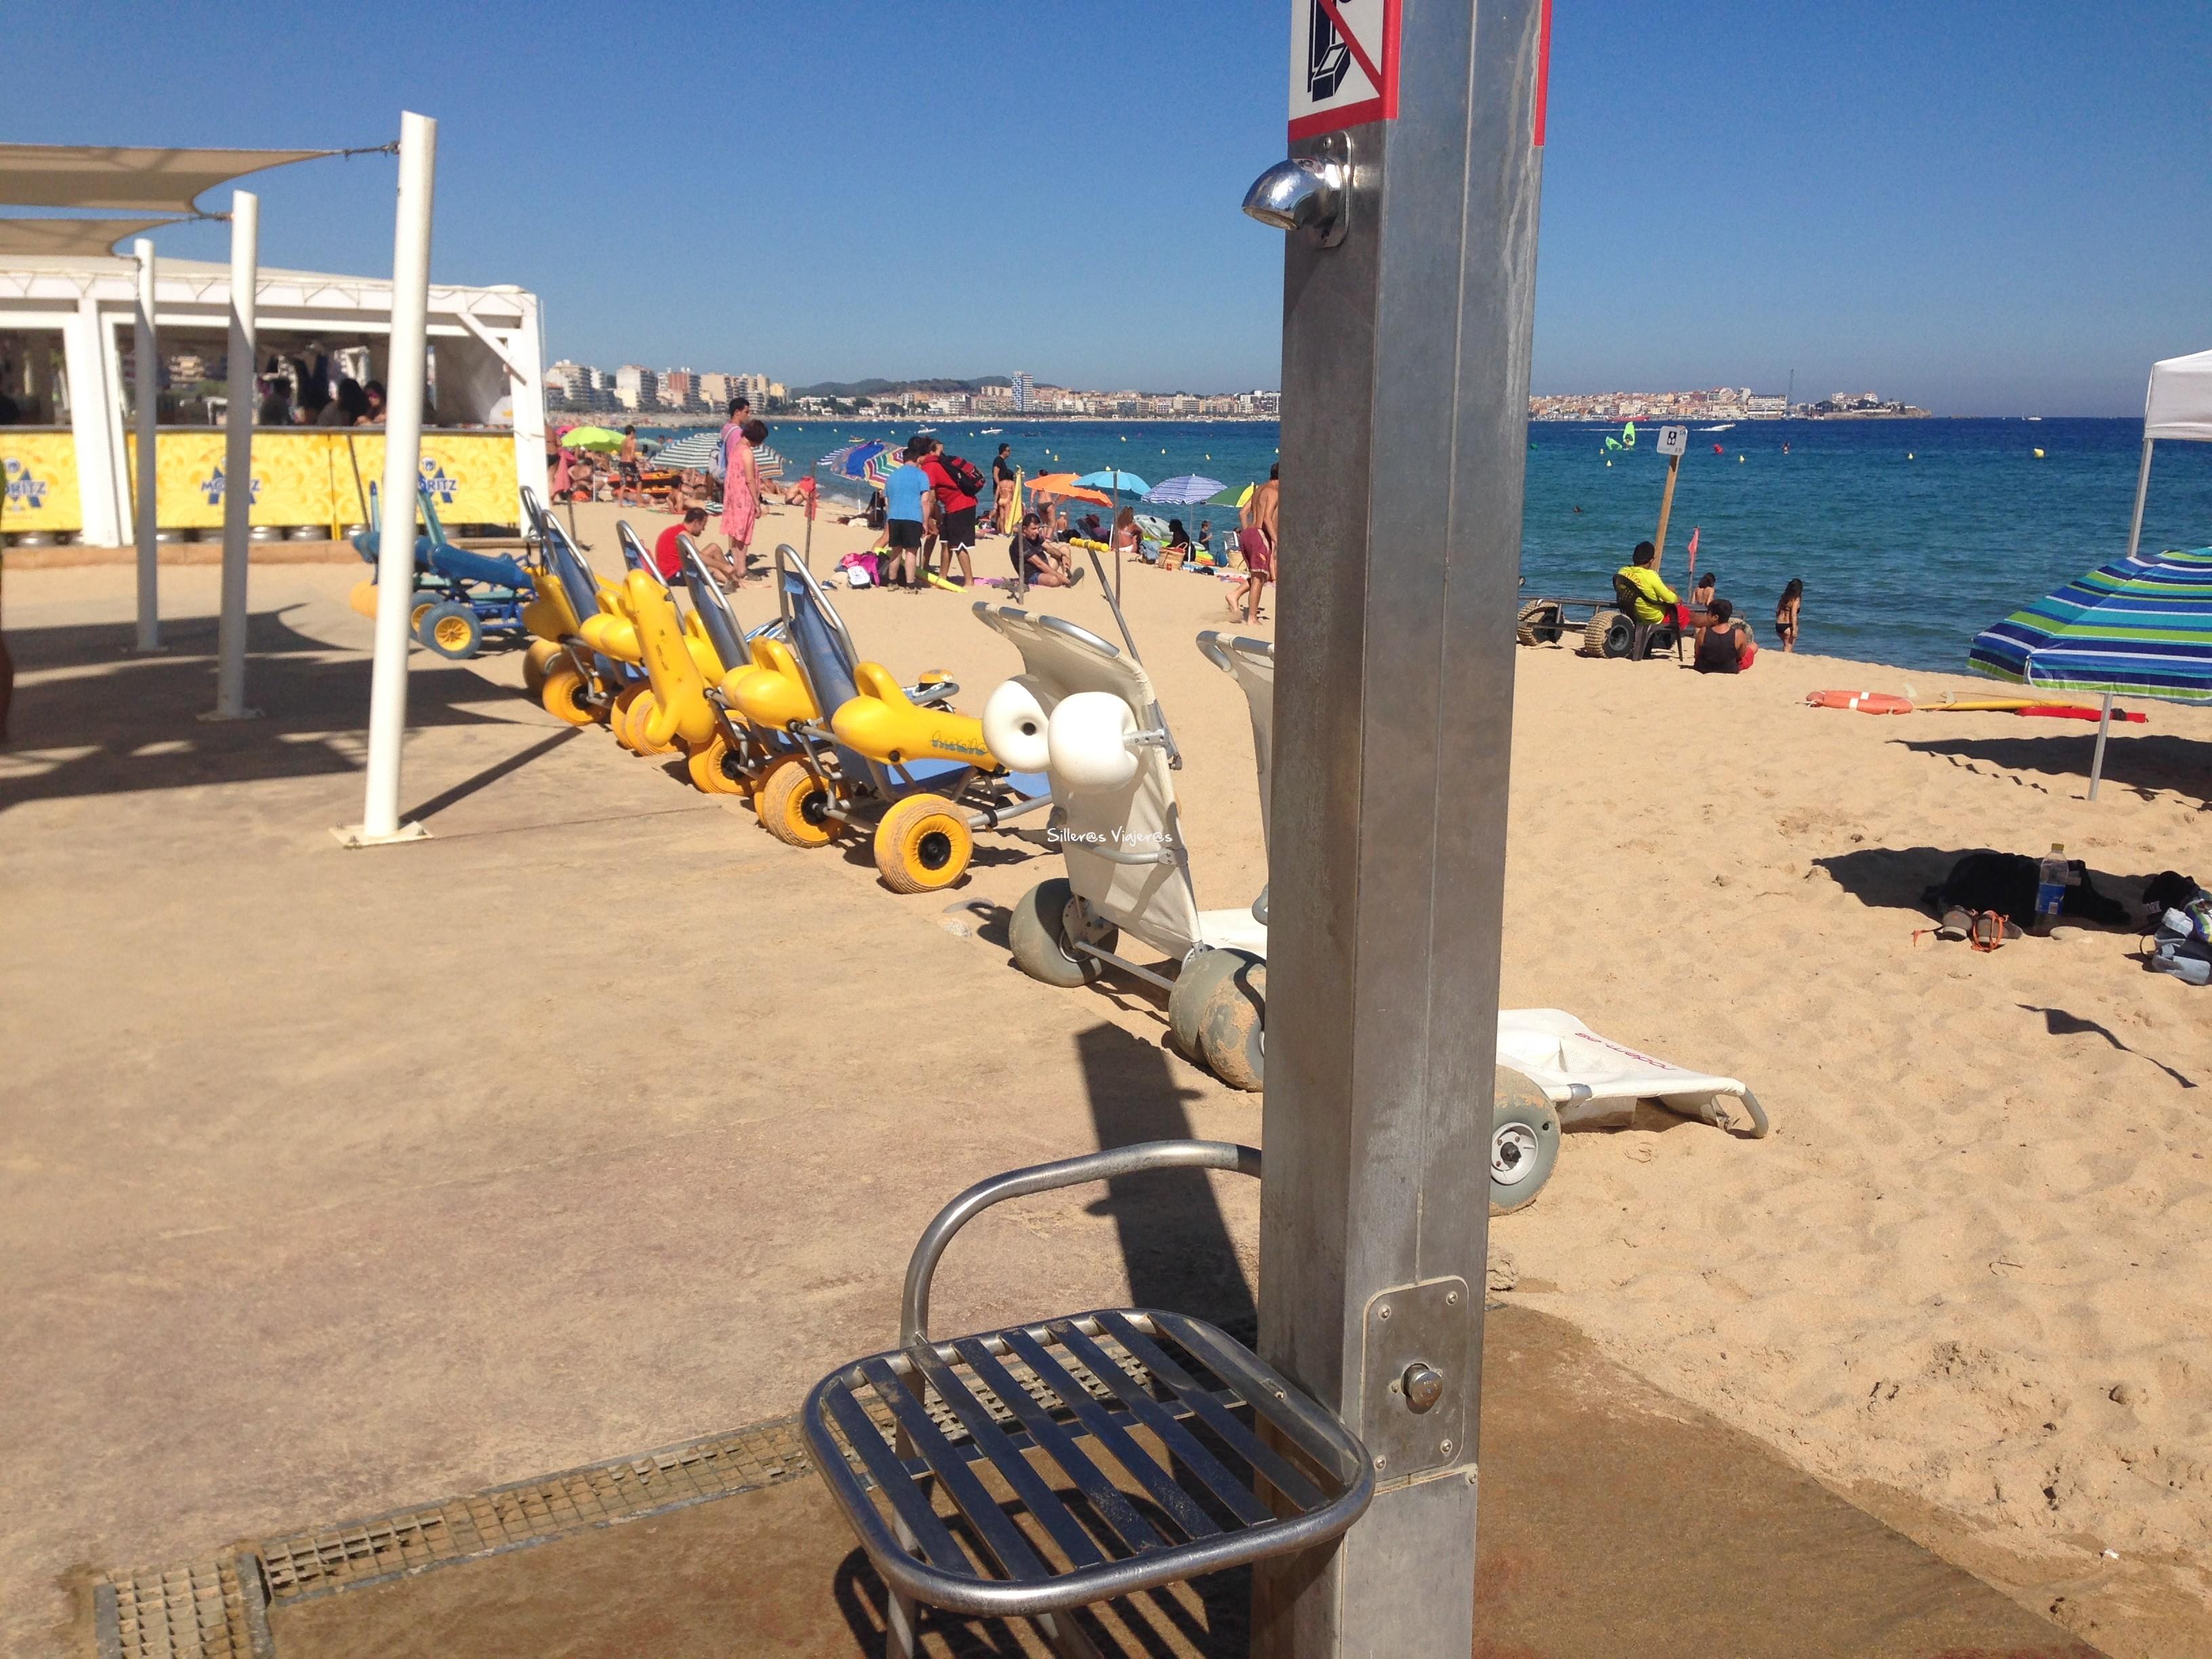 Ducha de la playa adaptada